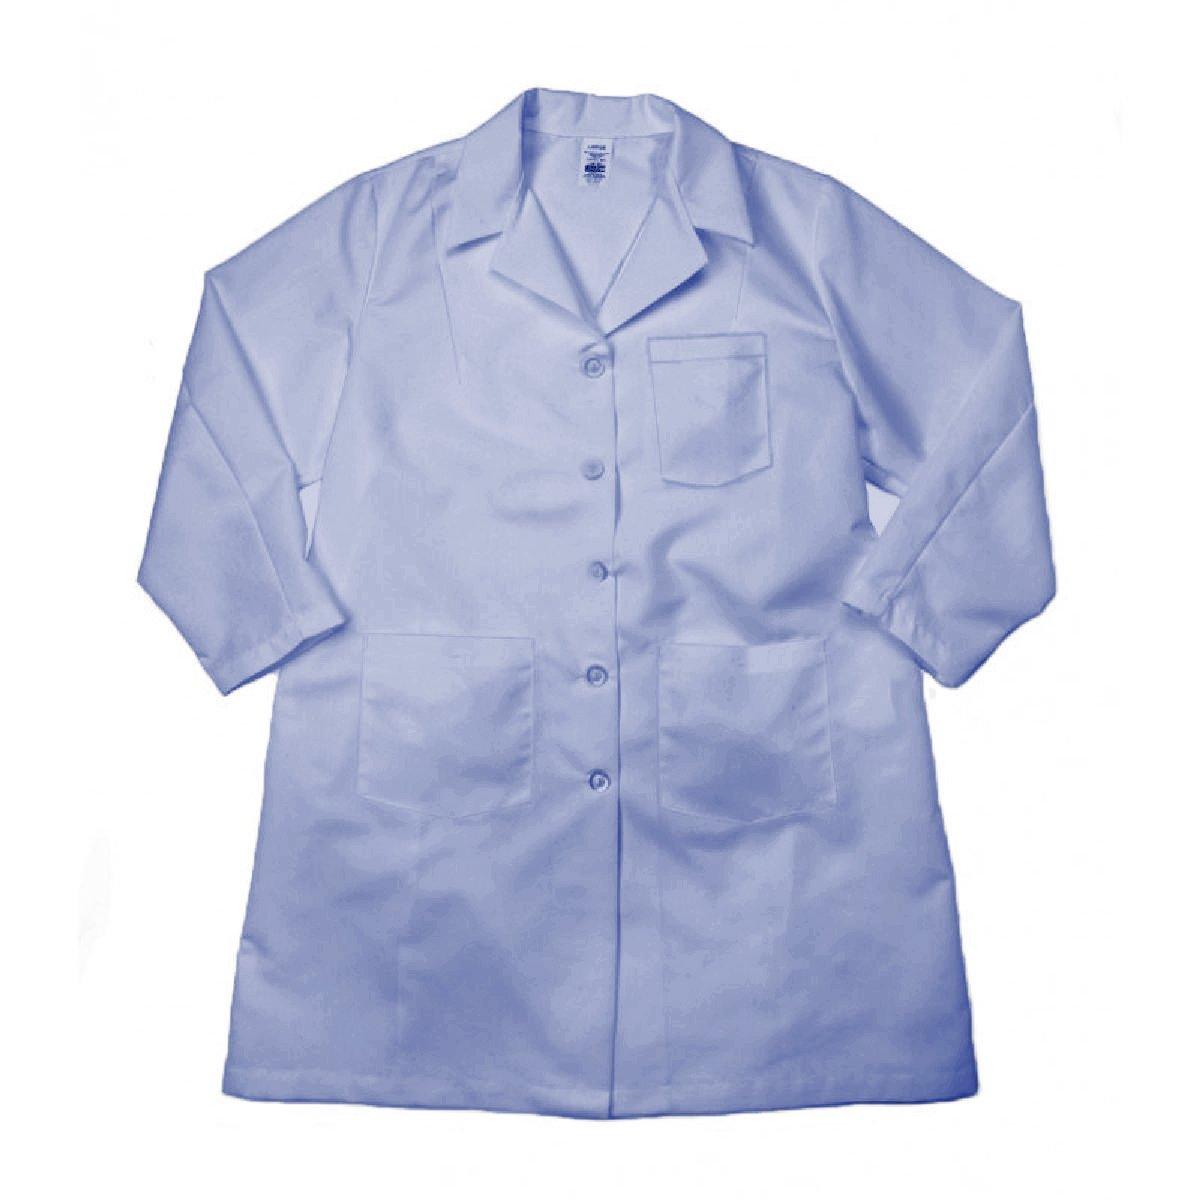 BUTTONS-X-Large-Light Blue Pinnacle Textiles L17F-XL-LB Pinnacle Textile L17F 5.25 OZ POPLIN 65//35 Polyester//Cotton FEMALE LAB COAT